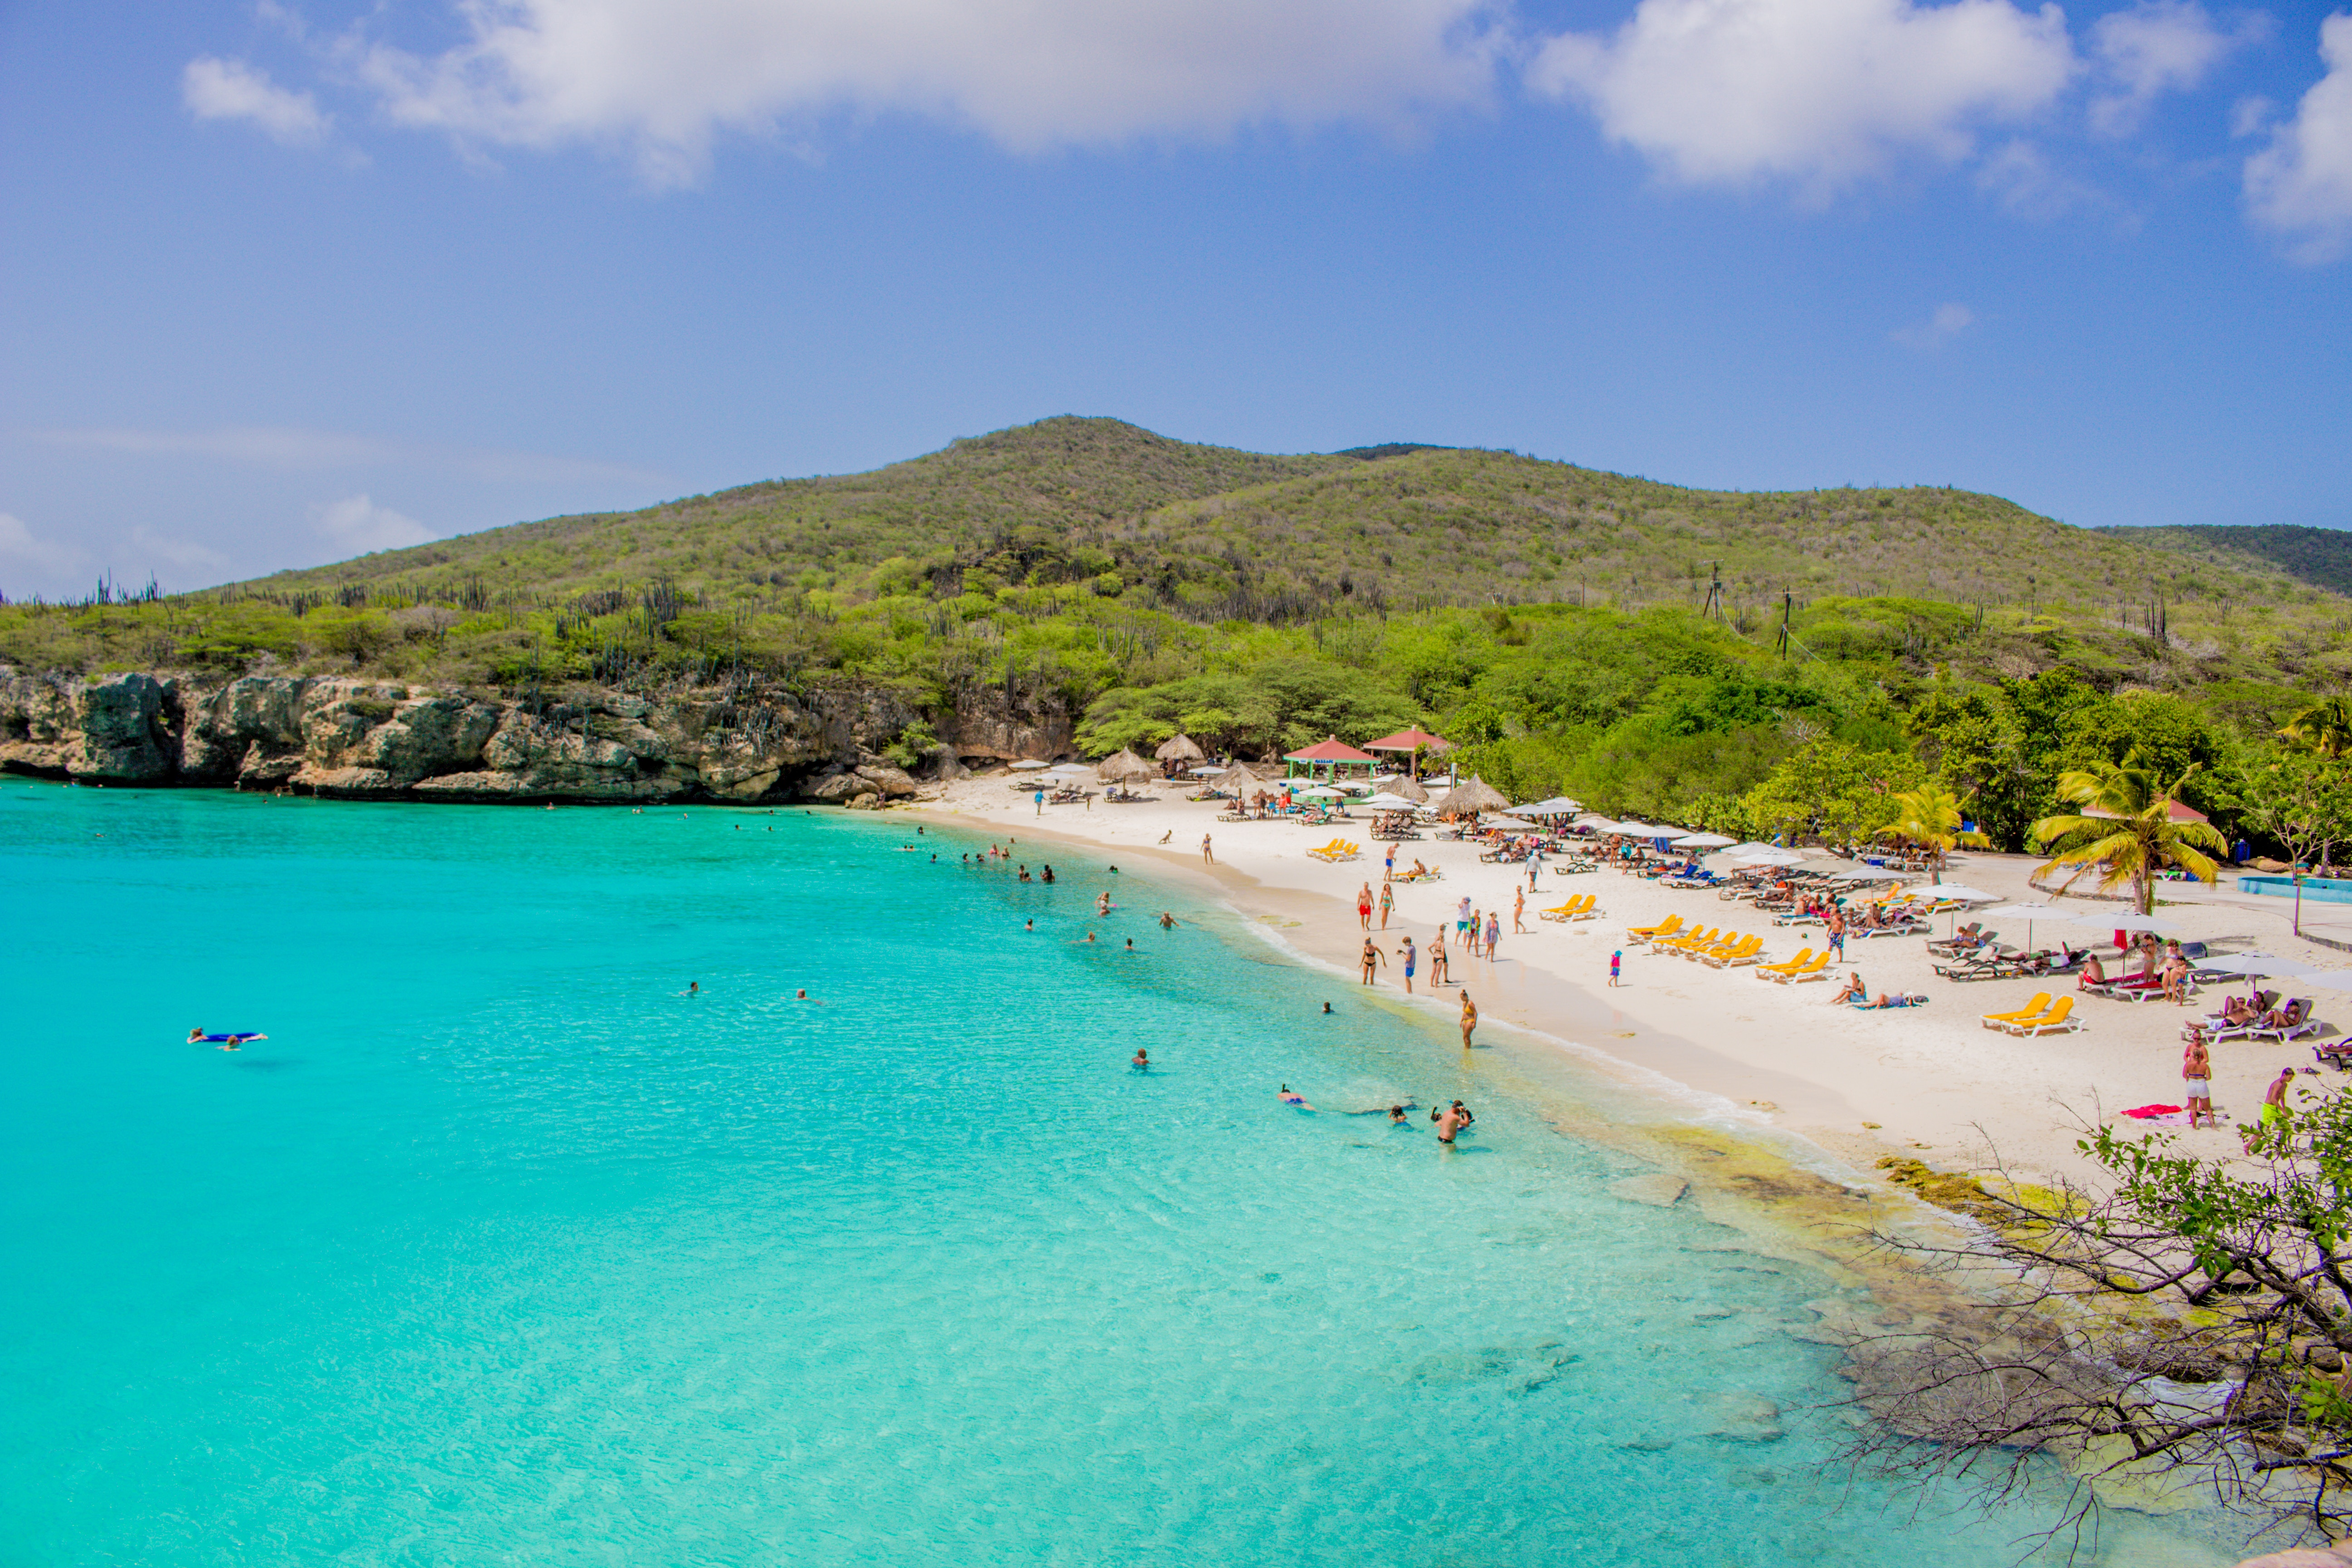 Grote Knip beach, Curaçao